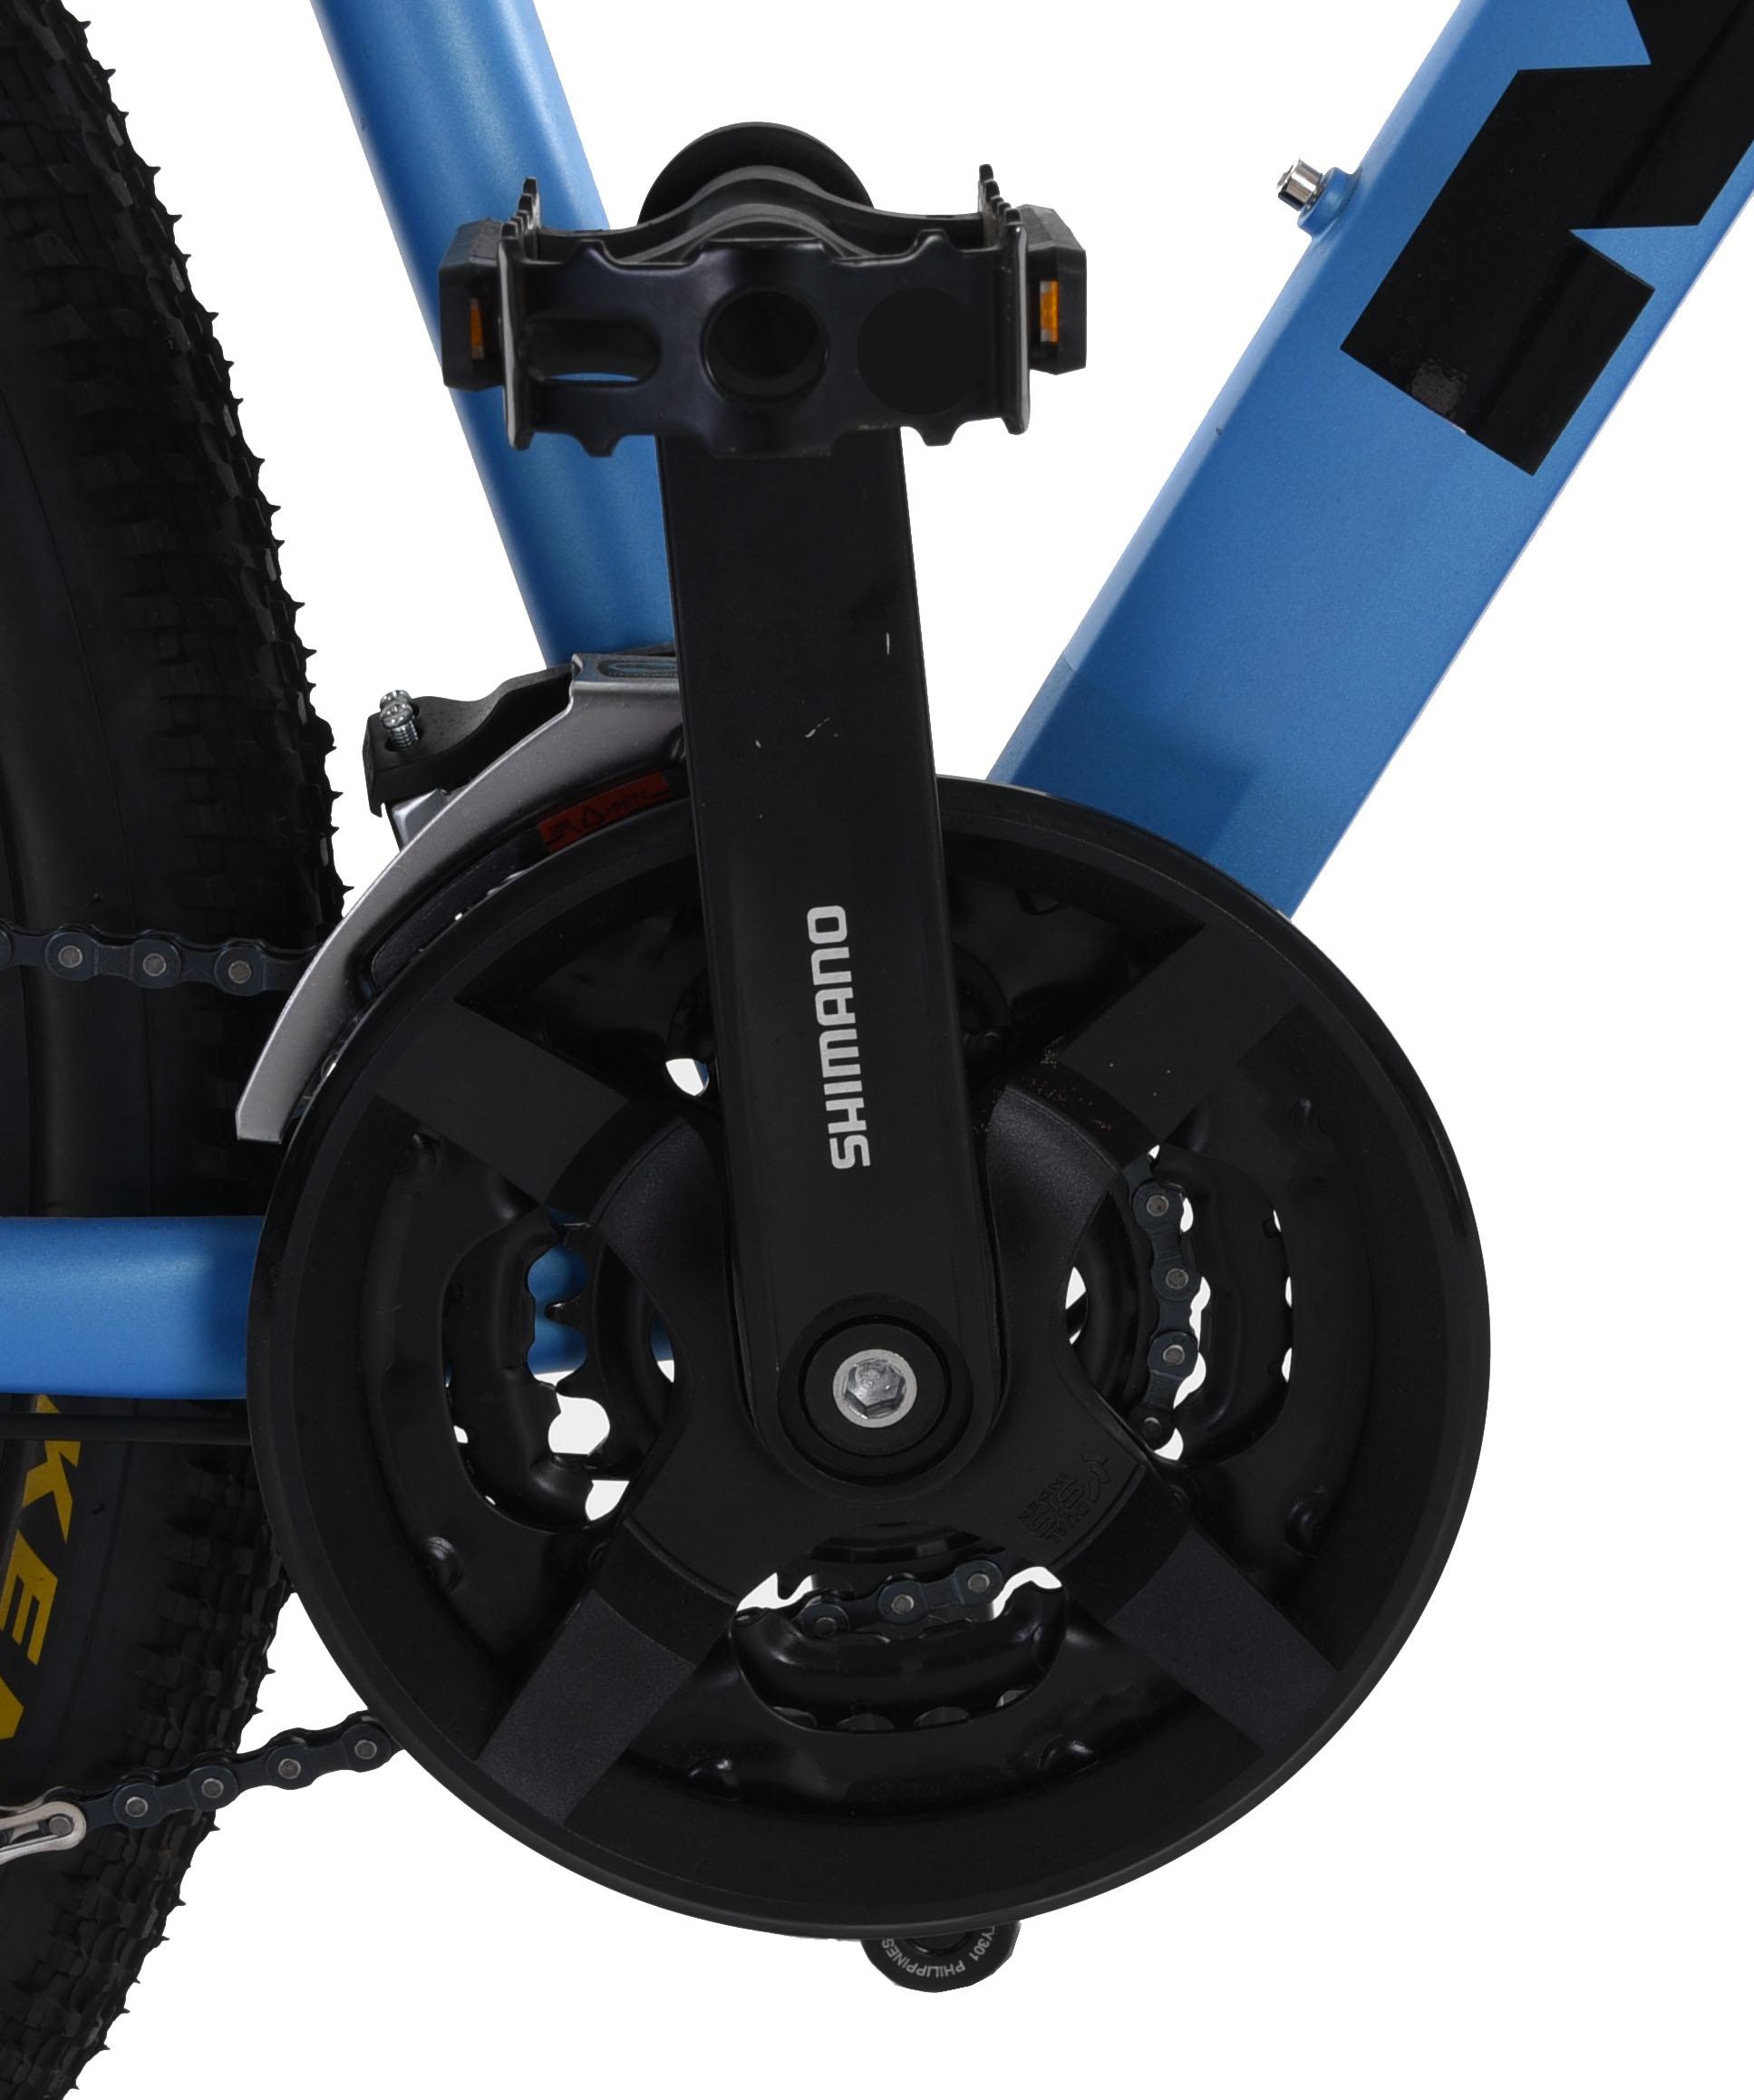 thumbnail 23 - COBRA 29er Mountain Bike 24 Speed MTB with 29-Inch Wheels